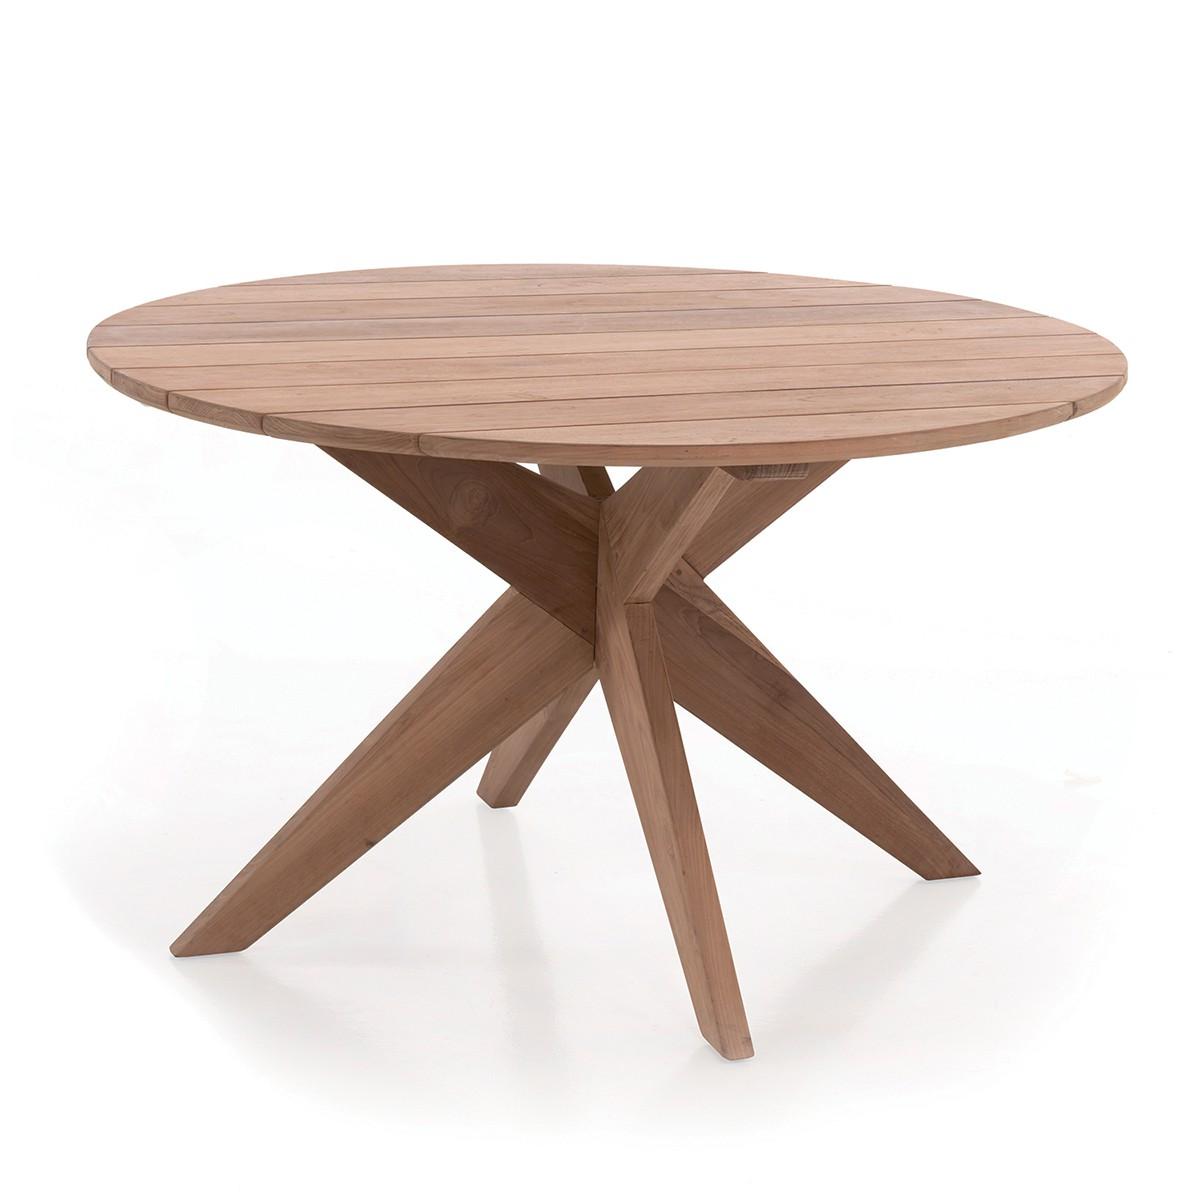 Table ronde en teck massif D 135 cm Sakai